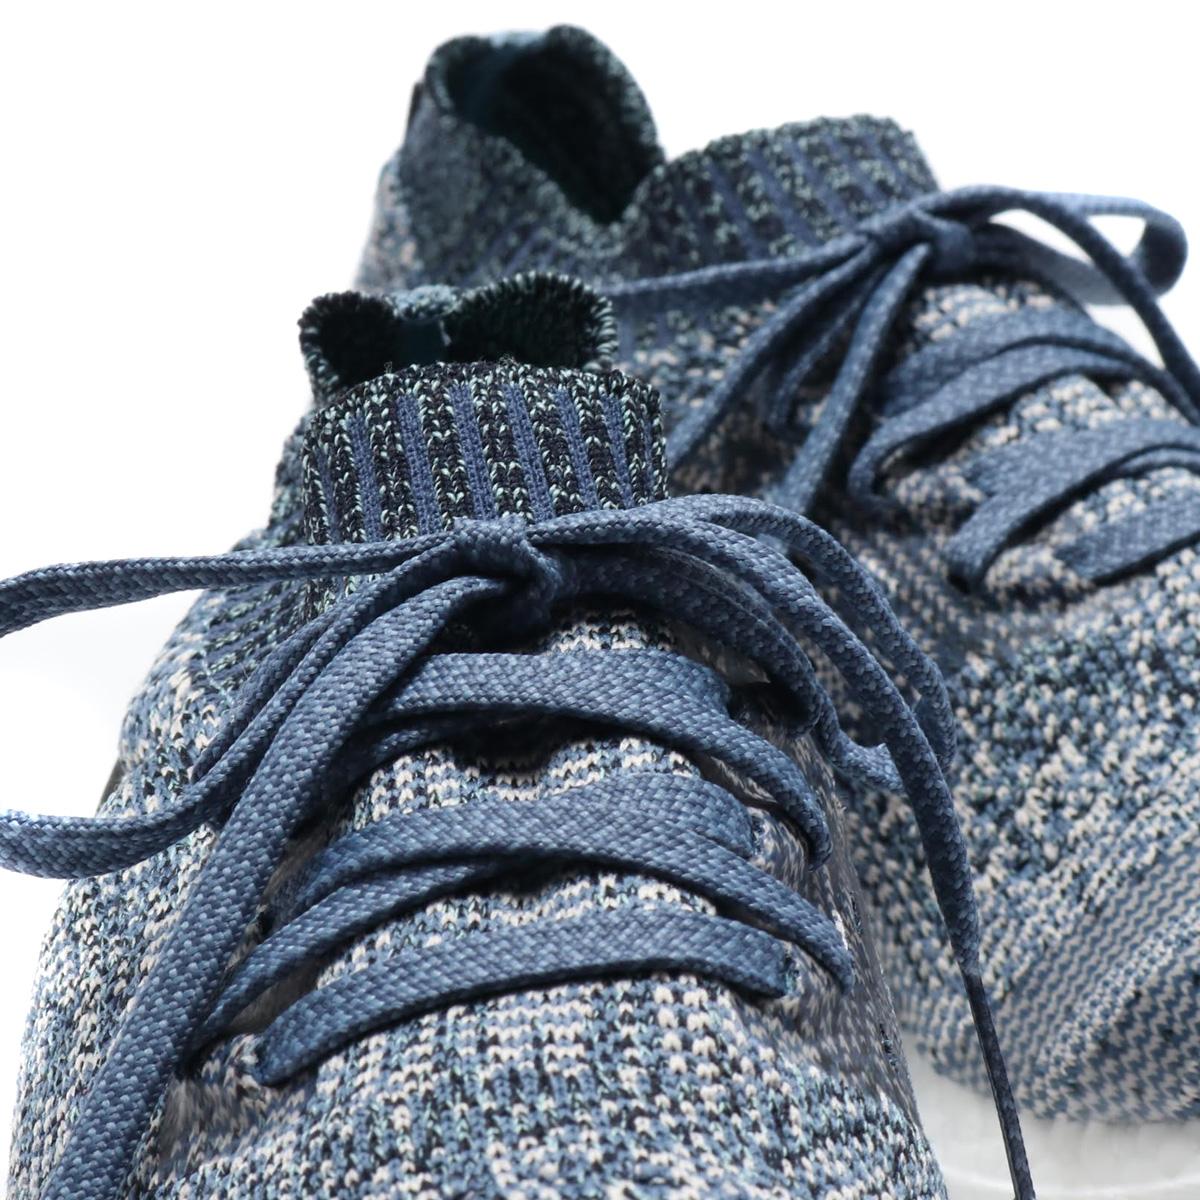 0d16c37a63cbe adidas UltraBOOST Uncaged Parley (アディダスウルトラブーストアンケージドパーレー) RAW GREY CHALK  PEARL BLUE SPIRIT 18FW-I